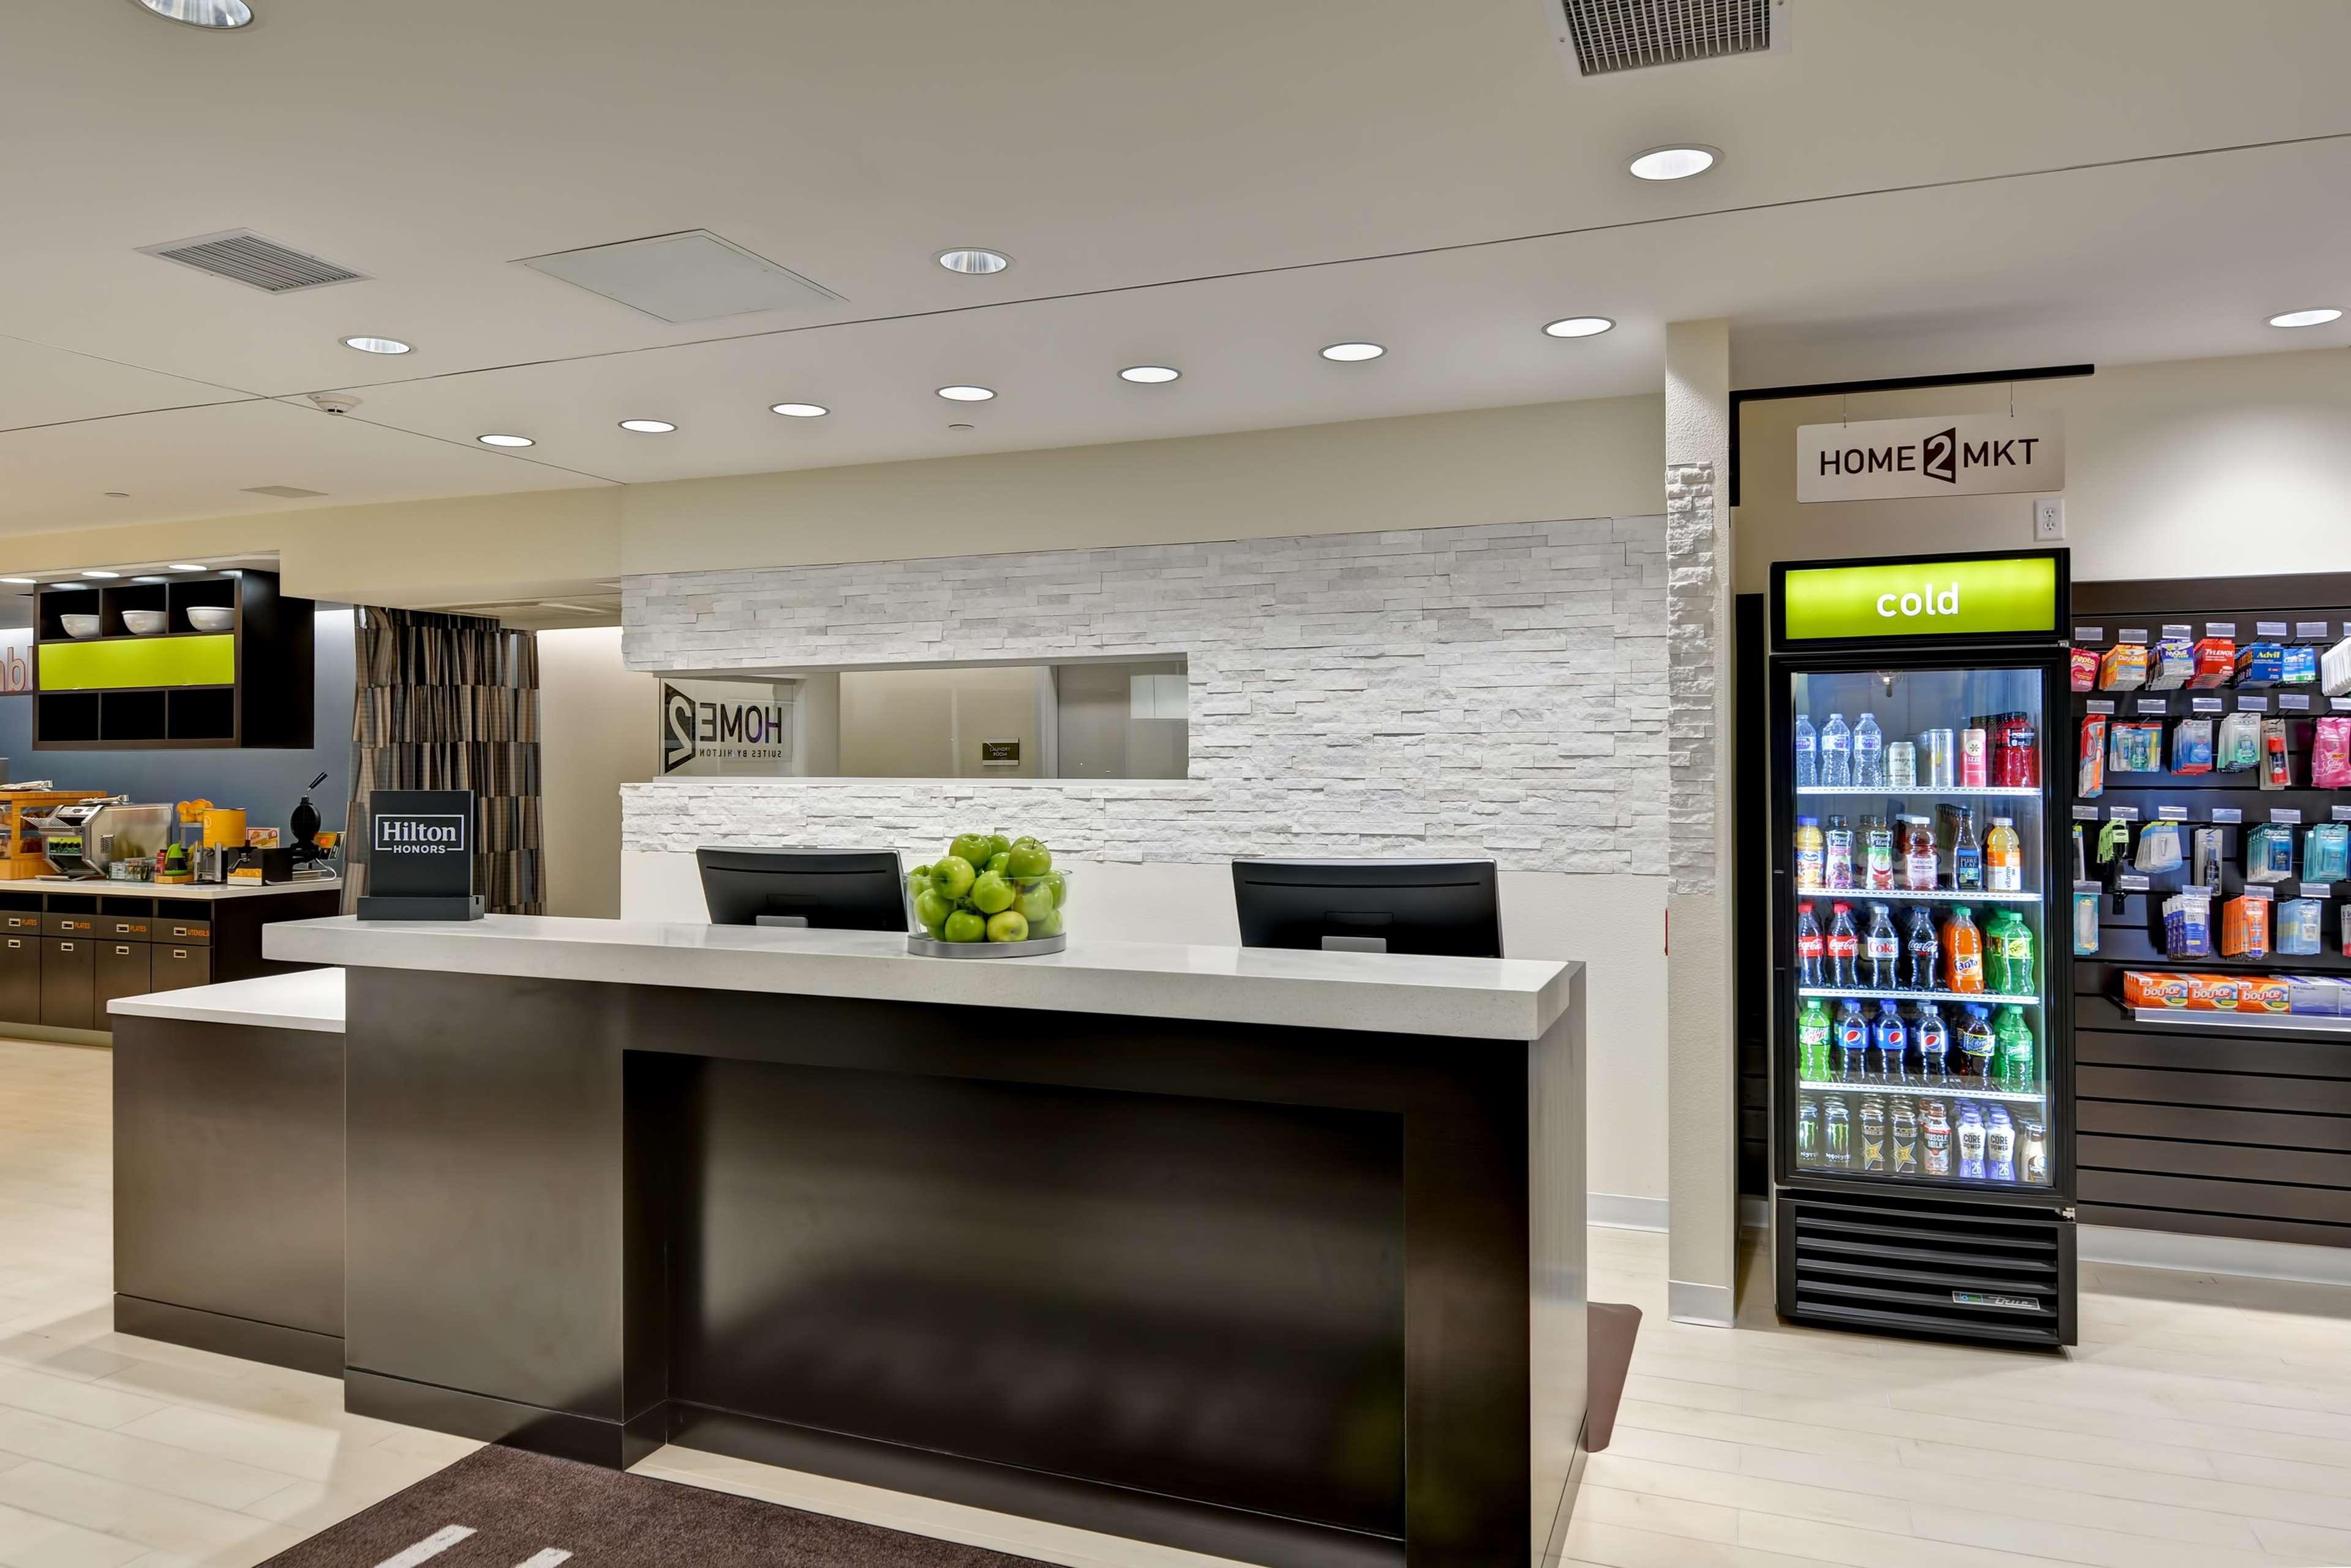 Home2 Suites by Hilton Azusa image 38